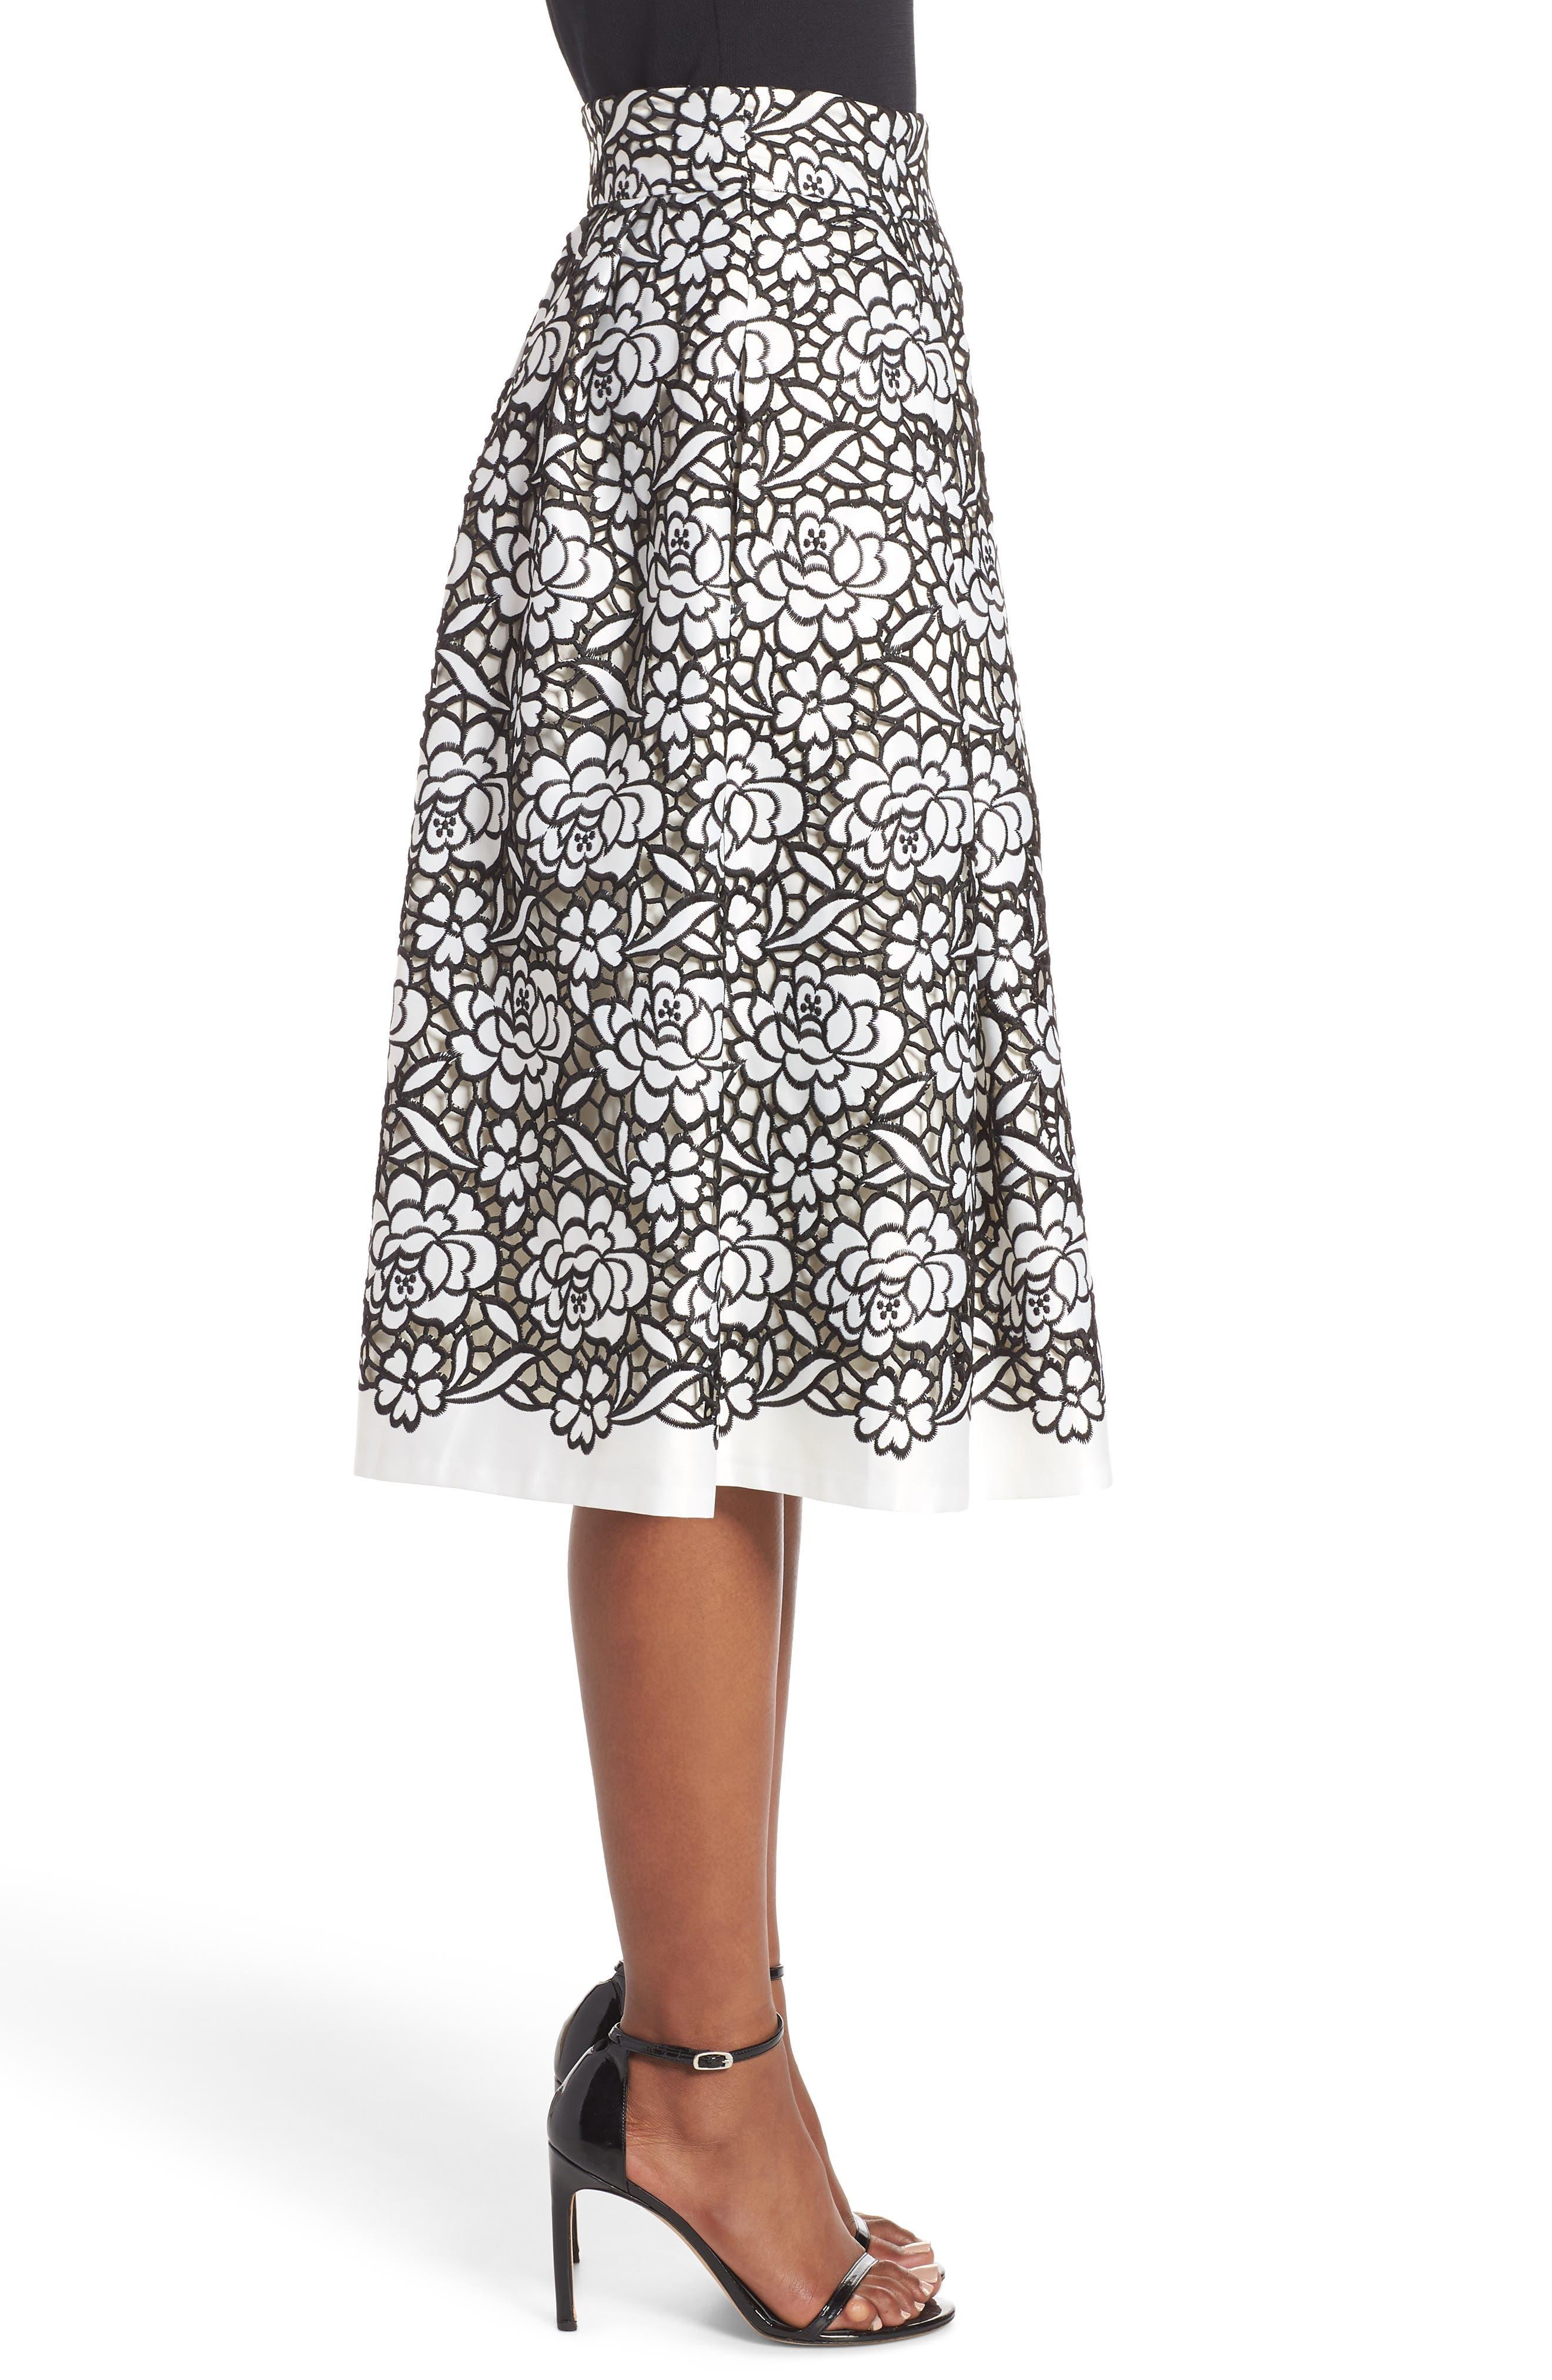 Pleated Floral Cutout Appliqué Skirt,                             Alternate thumbnail 3, color,                             BLACK/IVORY